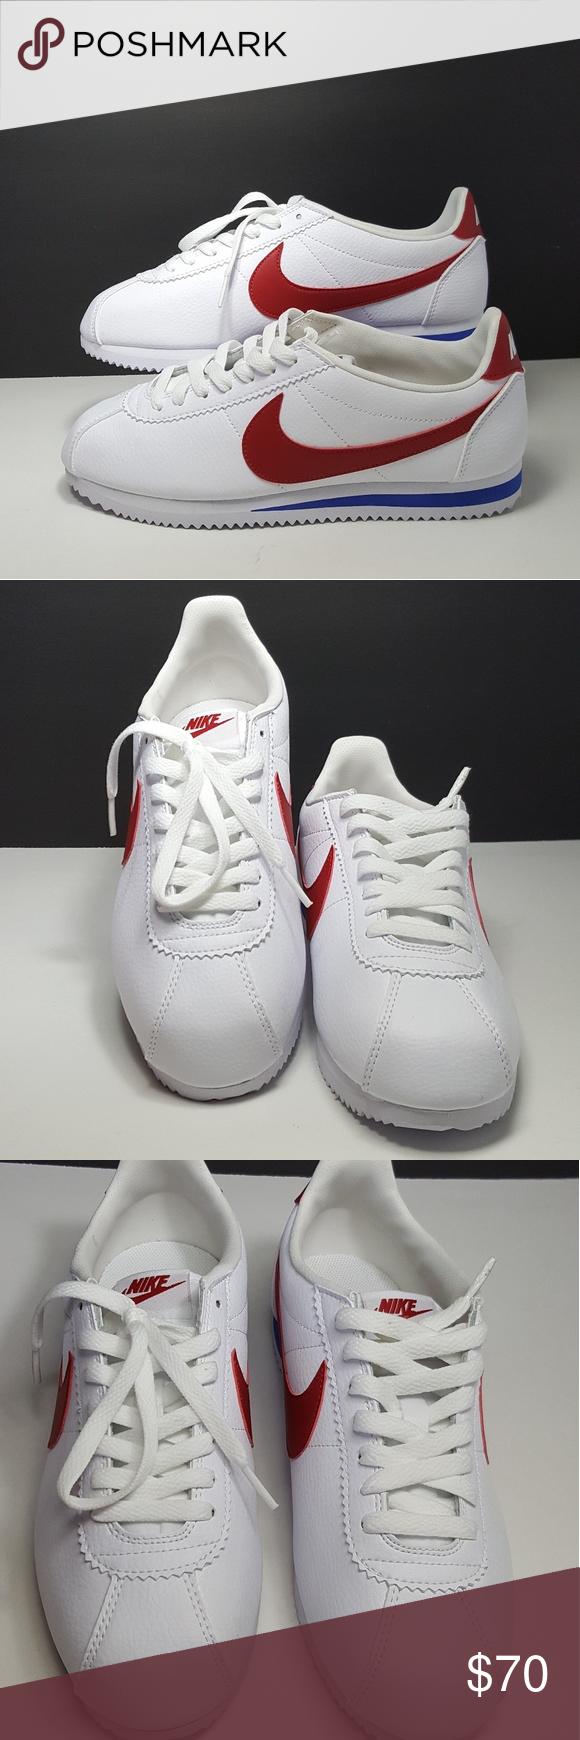 d0fc3bdac75 Nike Cortez